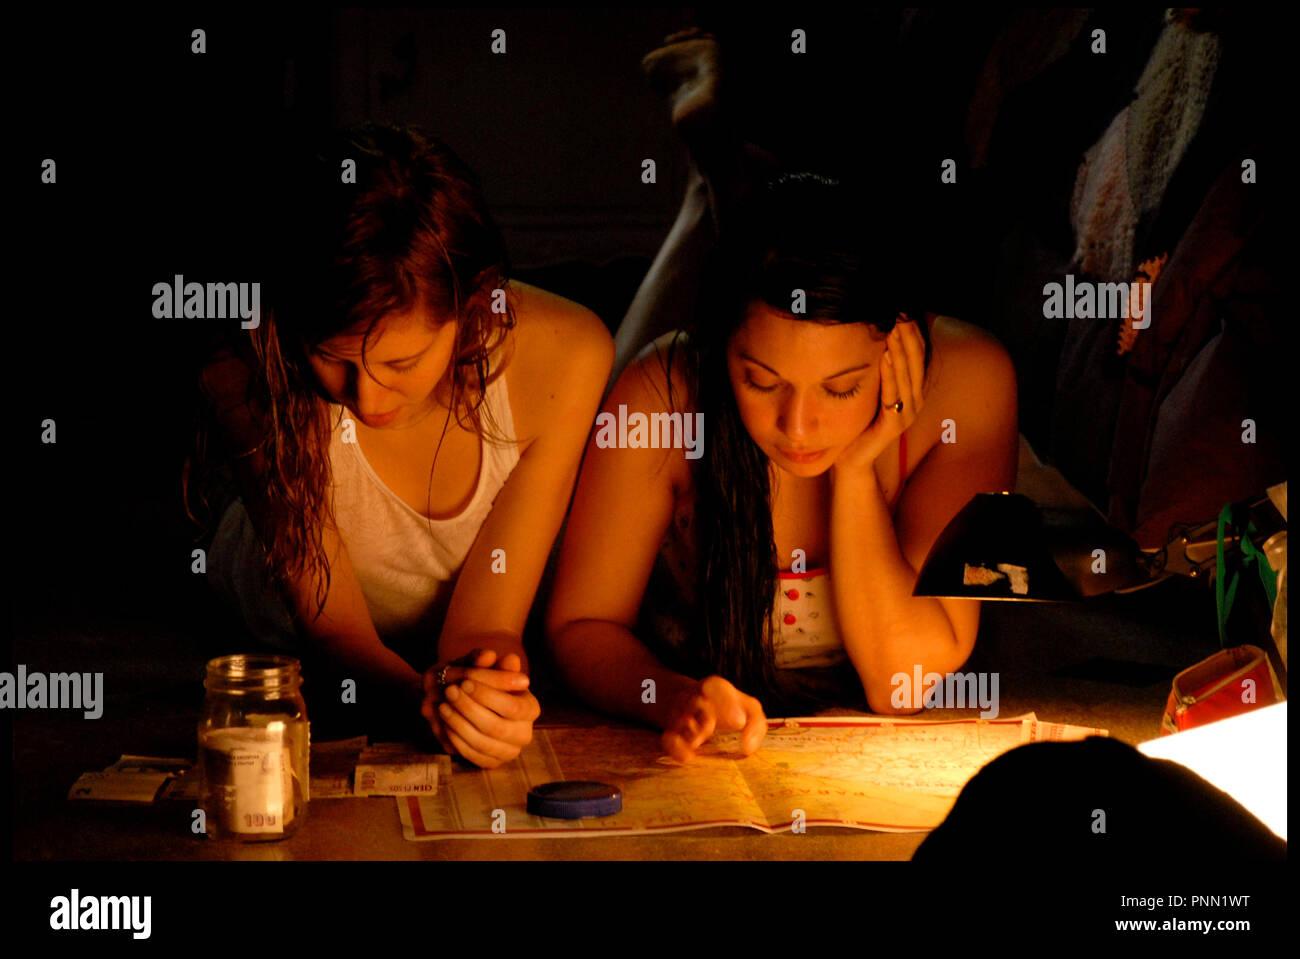 Prod DB © Historias Cinematograficas Cinemania - MK2 Productions - Wanda Visión S.A. / DR EL NINO PEZ de Lucía Puenzo 2009 ARG./FRA./ESP. avec Inés Efron et Mariela Vitale adolescente, lire, bougie, carte routiere Stock Photo